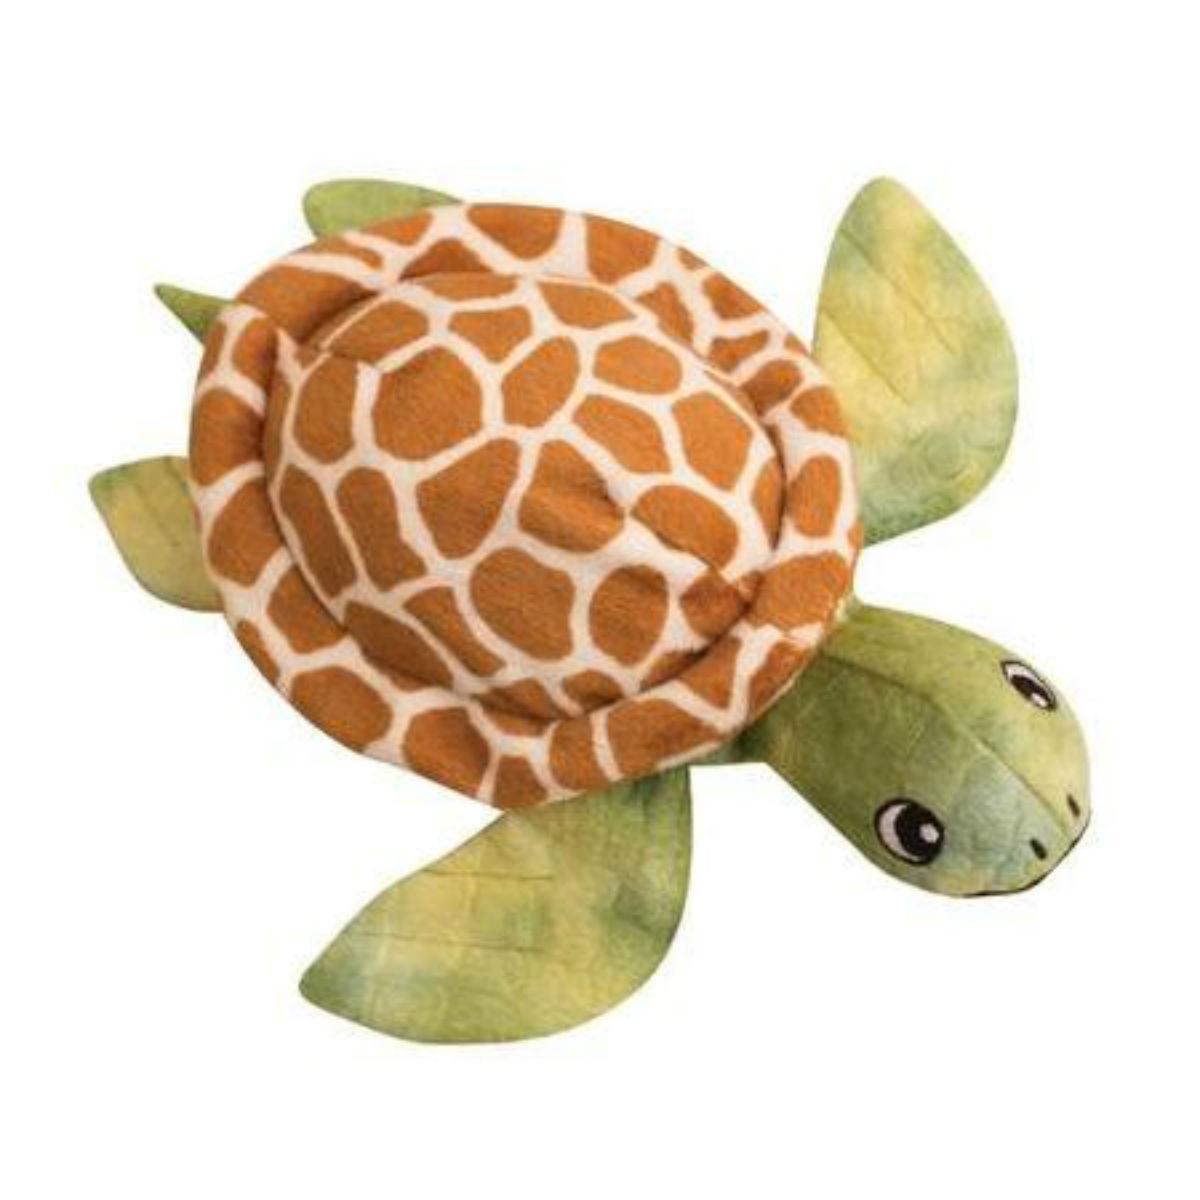 Snugarooz Shelldon the Turtle Dog Toy - Green